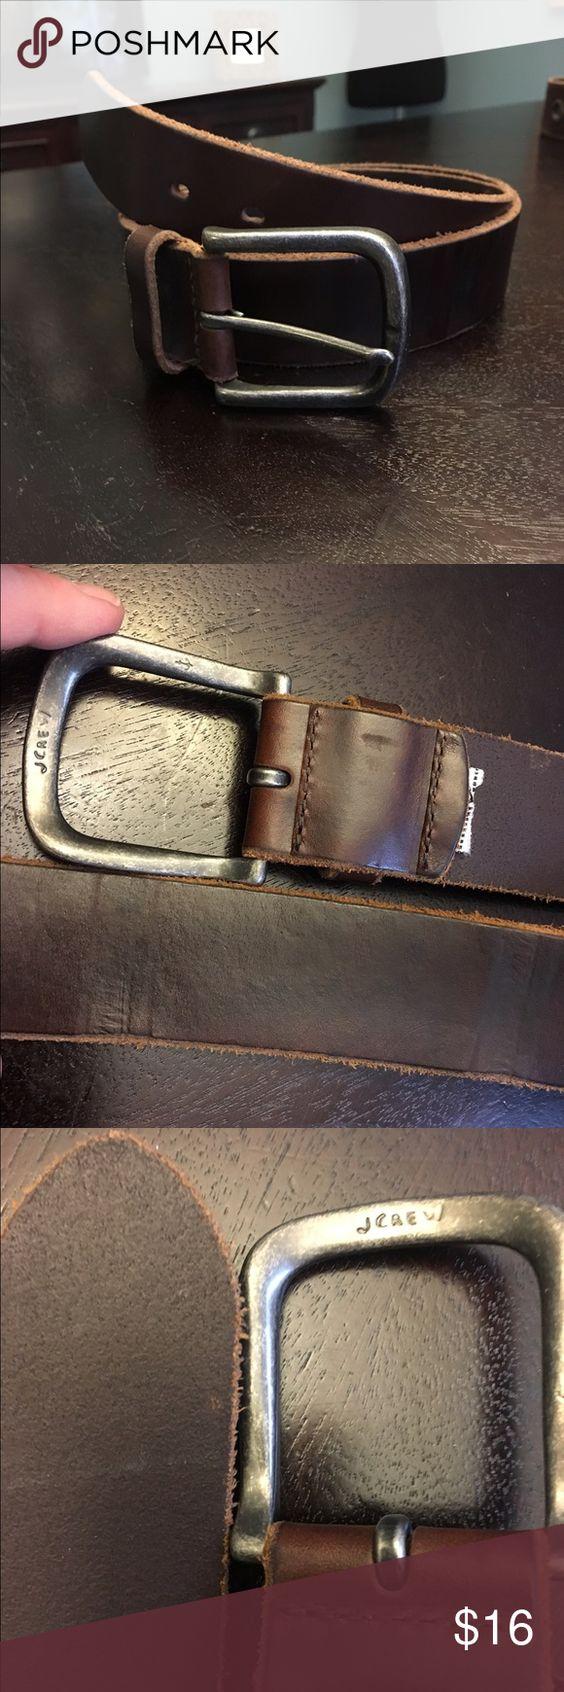 J.Crew belt Sturdy brown leather J.Crew baker preowned. Usual wear. Nice belt. J. Crew Accessories Belts